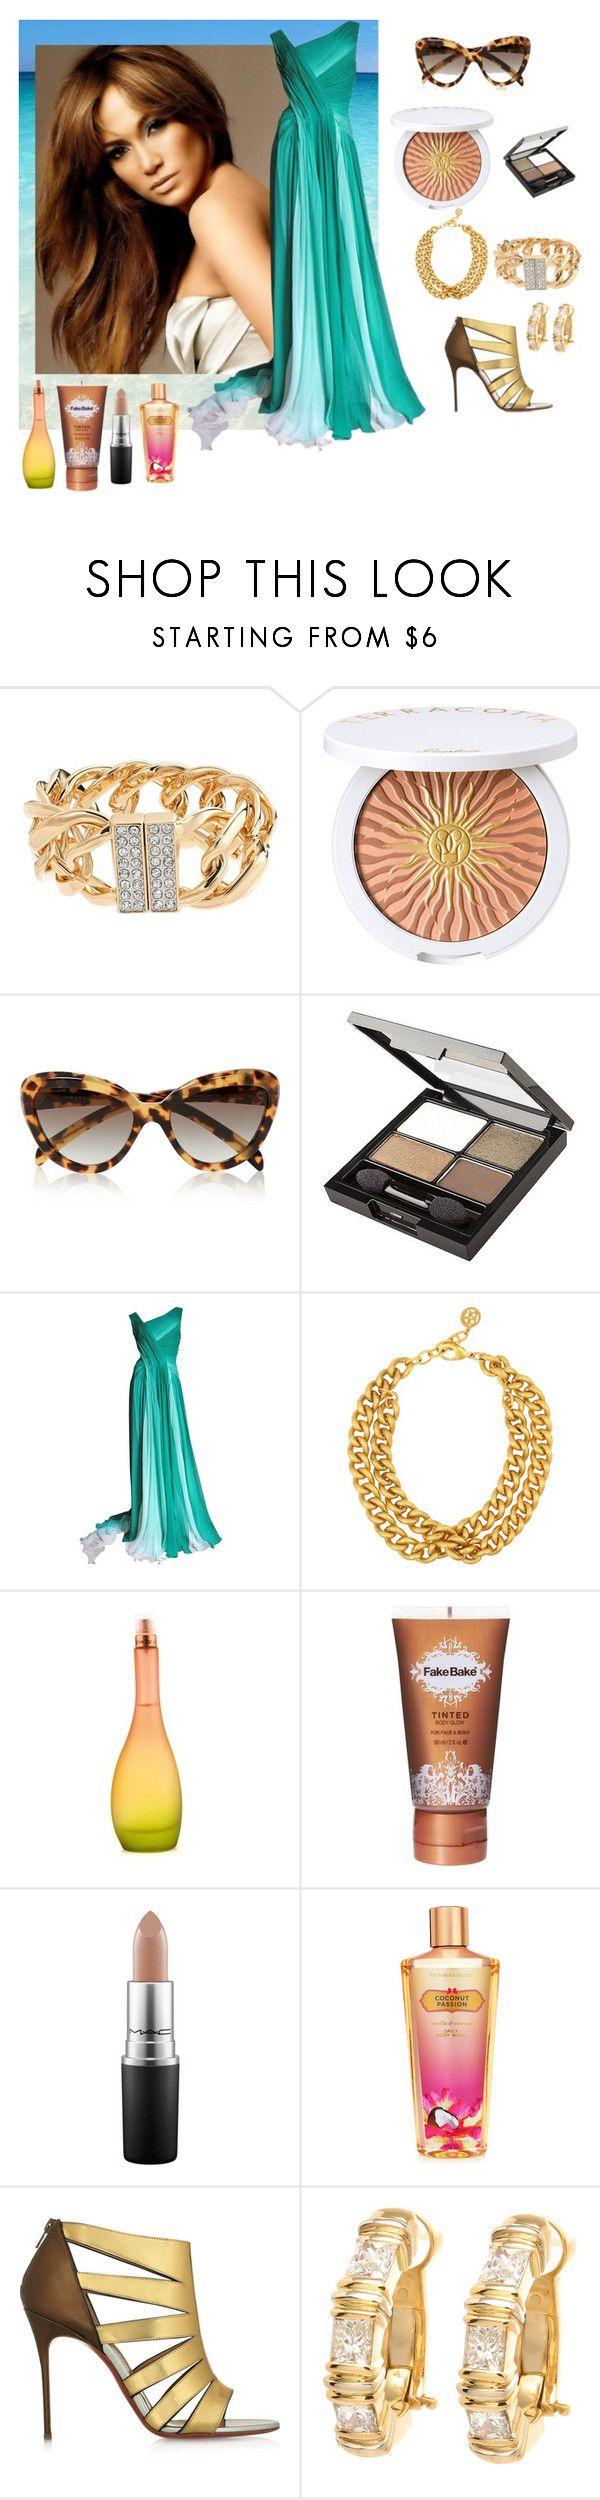 """Jennifer Lopez Style"" by fashionfan-8 ❤ liked on Polyvore featuring Jennifer Lopez, Guerlain, Prada, Revlon, Monique Lhuillier, Ben-Amun, JLo by Jennifer Lopez, Fake Bake, MAC Cosmetics and Victoria's Secret"